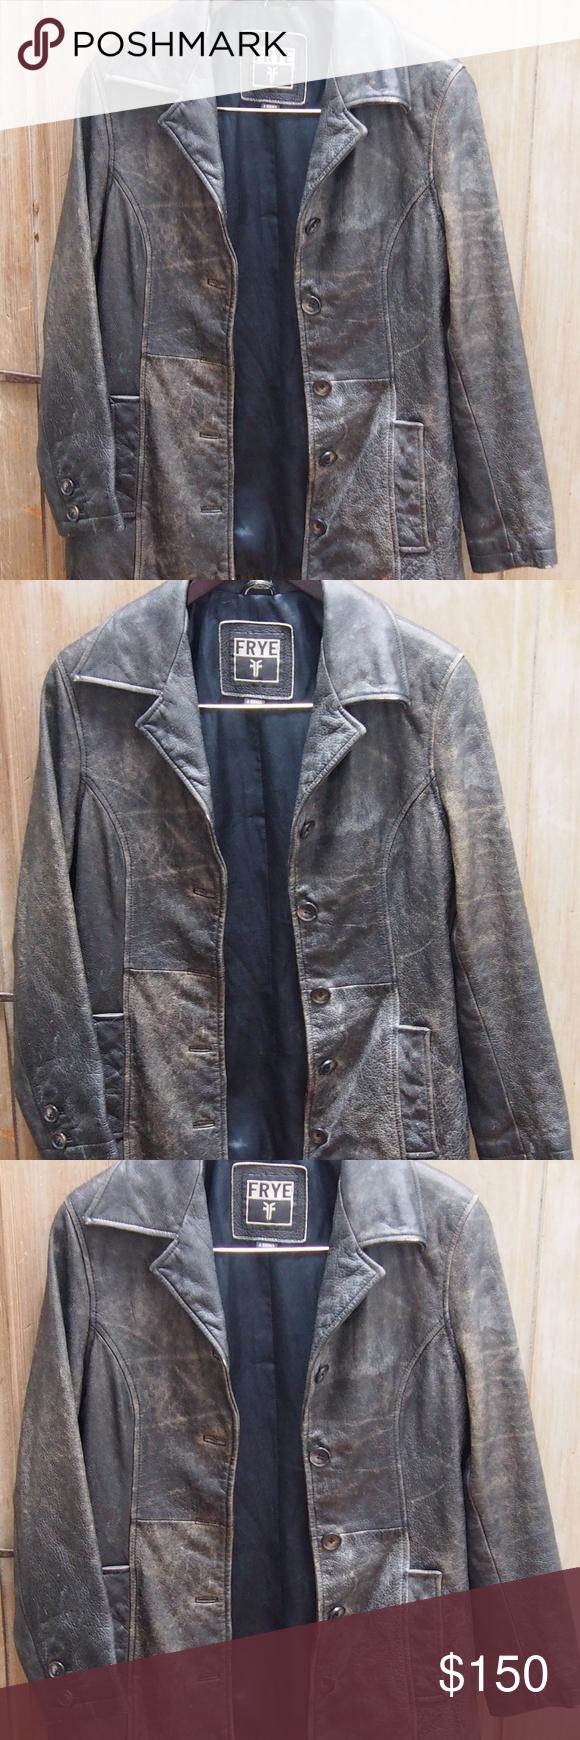 Frye Vtg Classic Rugged Distressed Leather Jacket Distressed Leather Jacket Vintage Leather Jacket Fashion